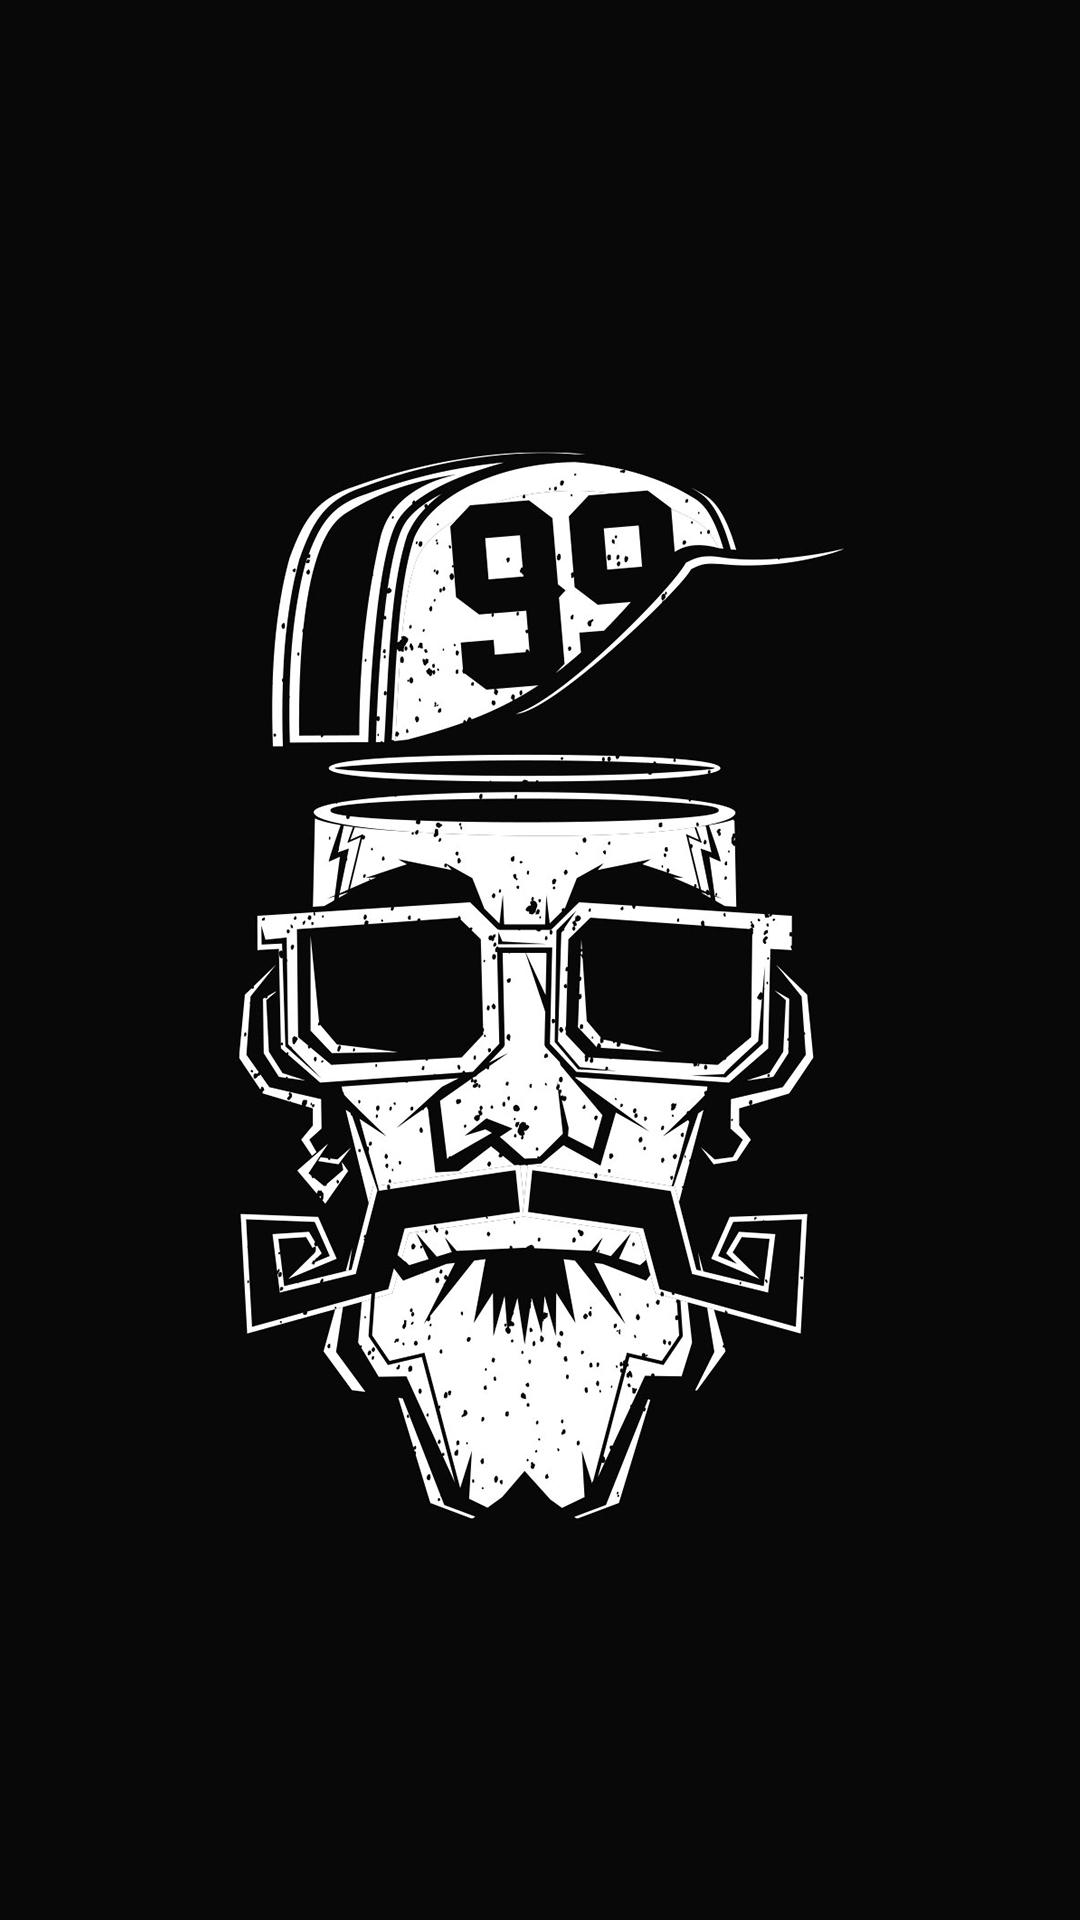 Hookah Hd Wallpaper Hip Hop Thug Life Iphone Wallpaper Iphone Wallpapers